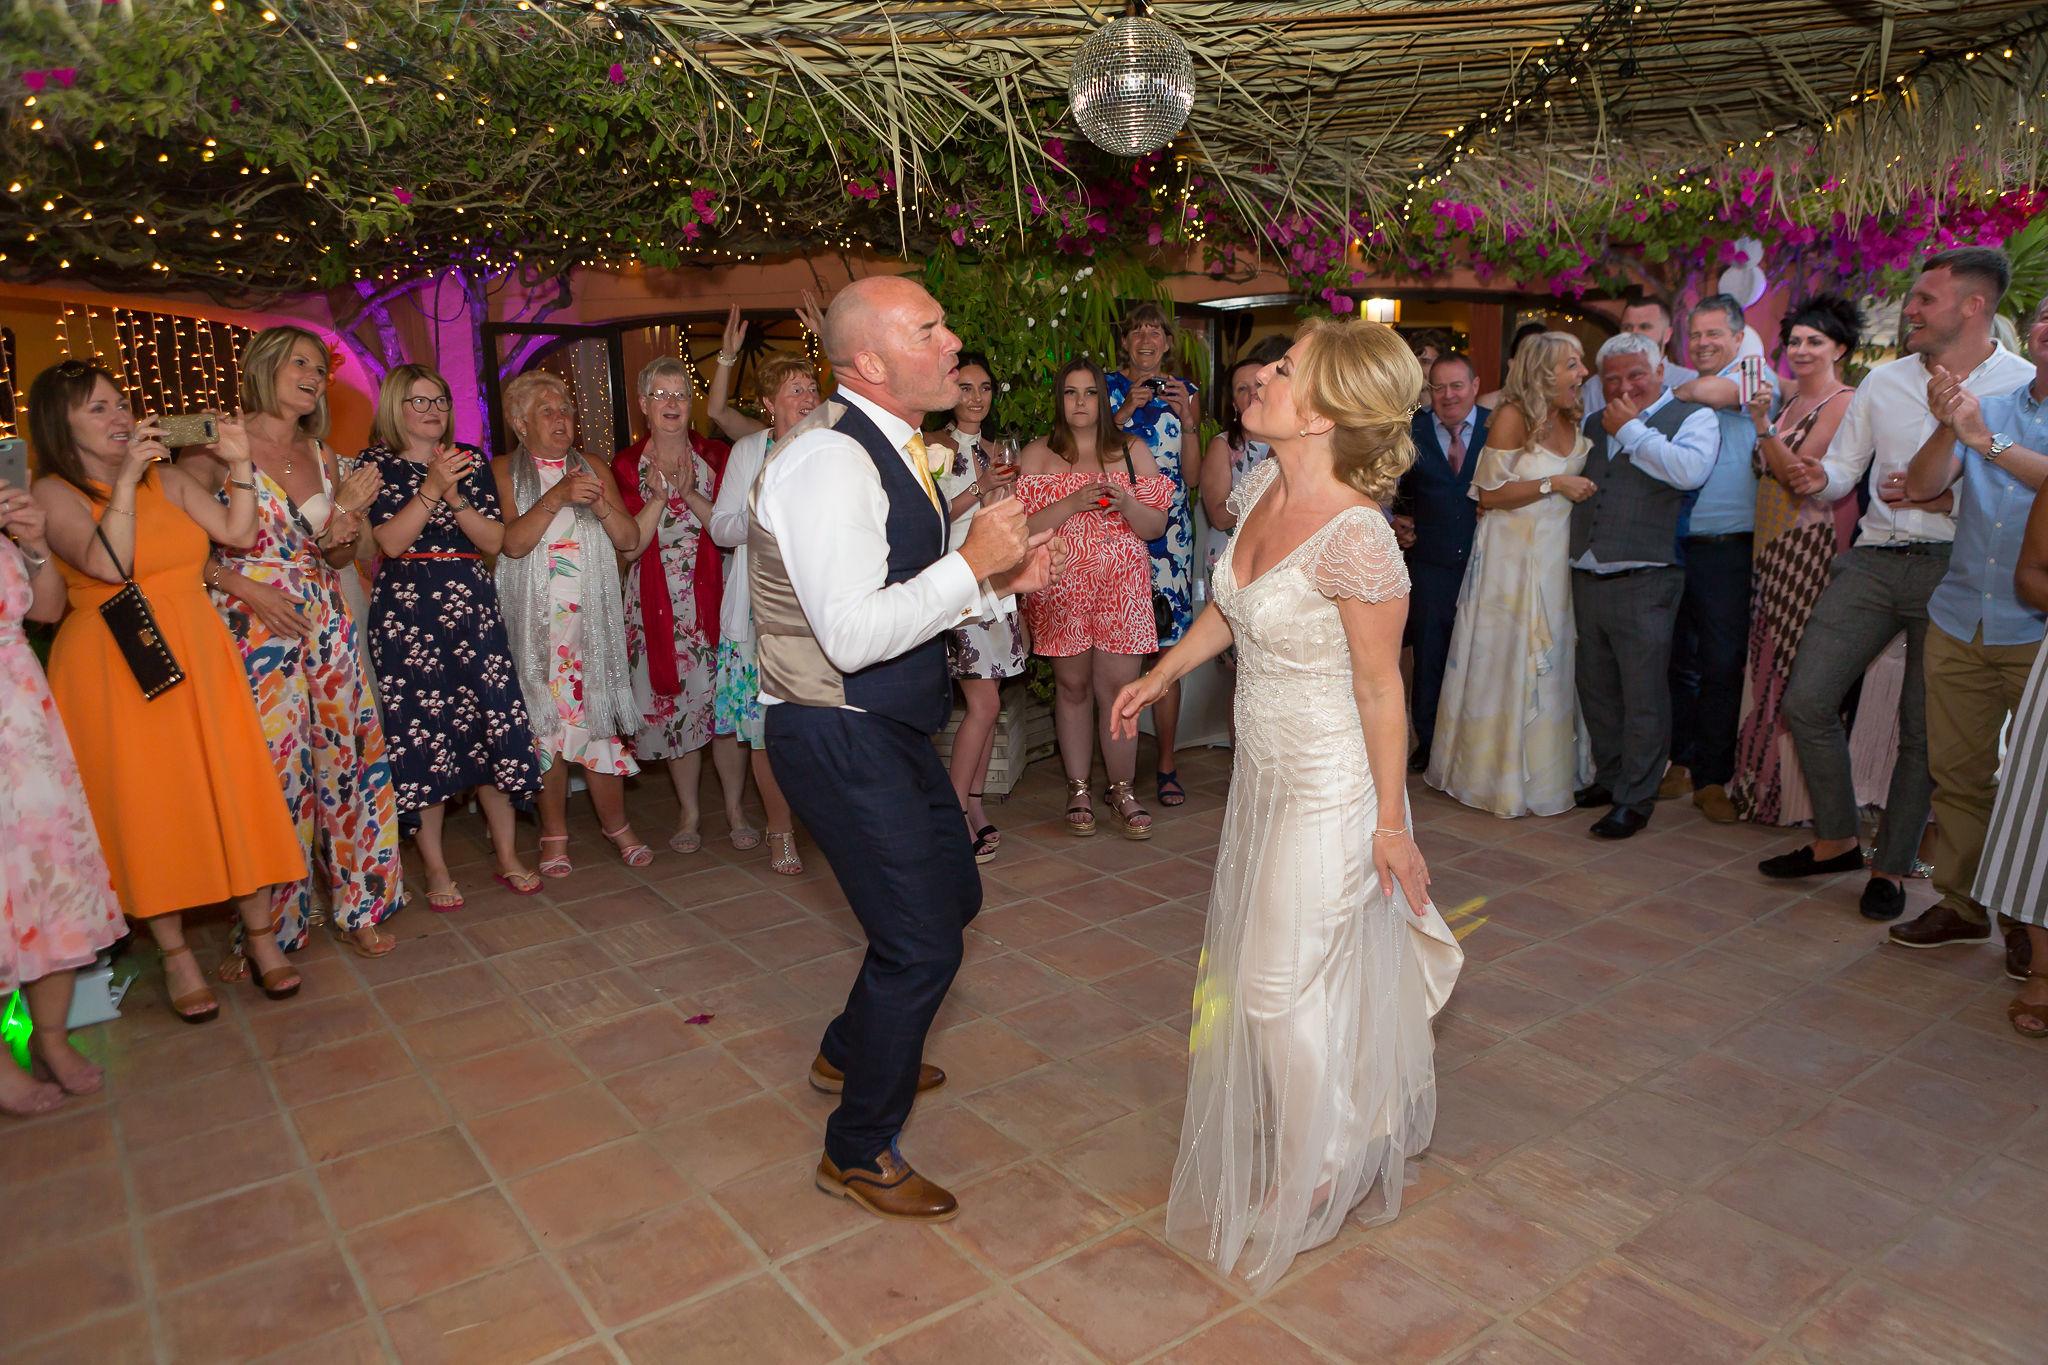 wedding - planning - algarve